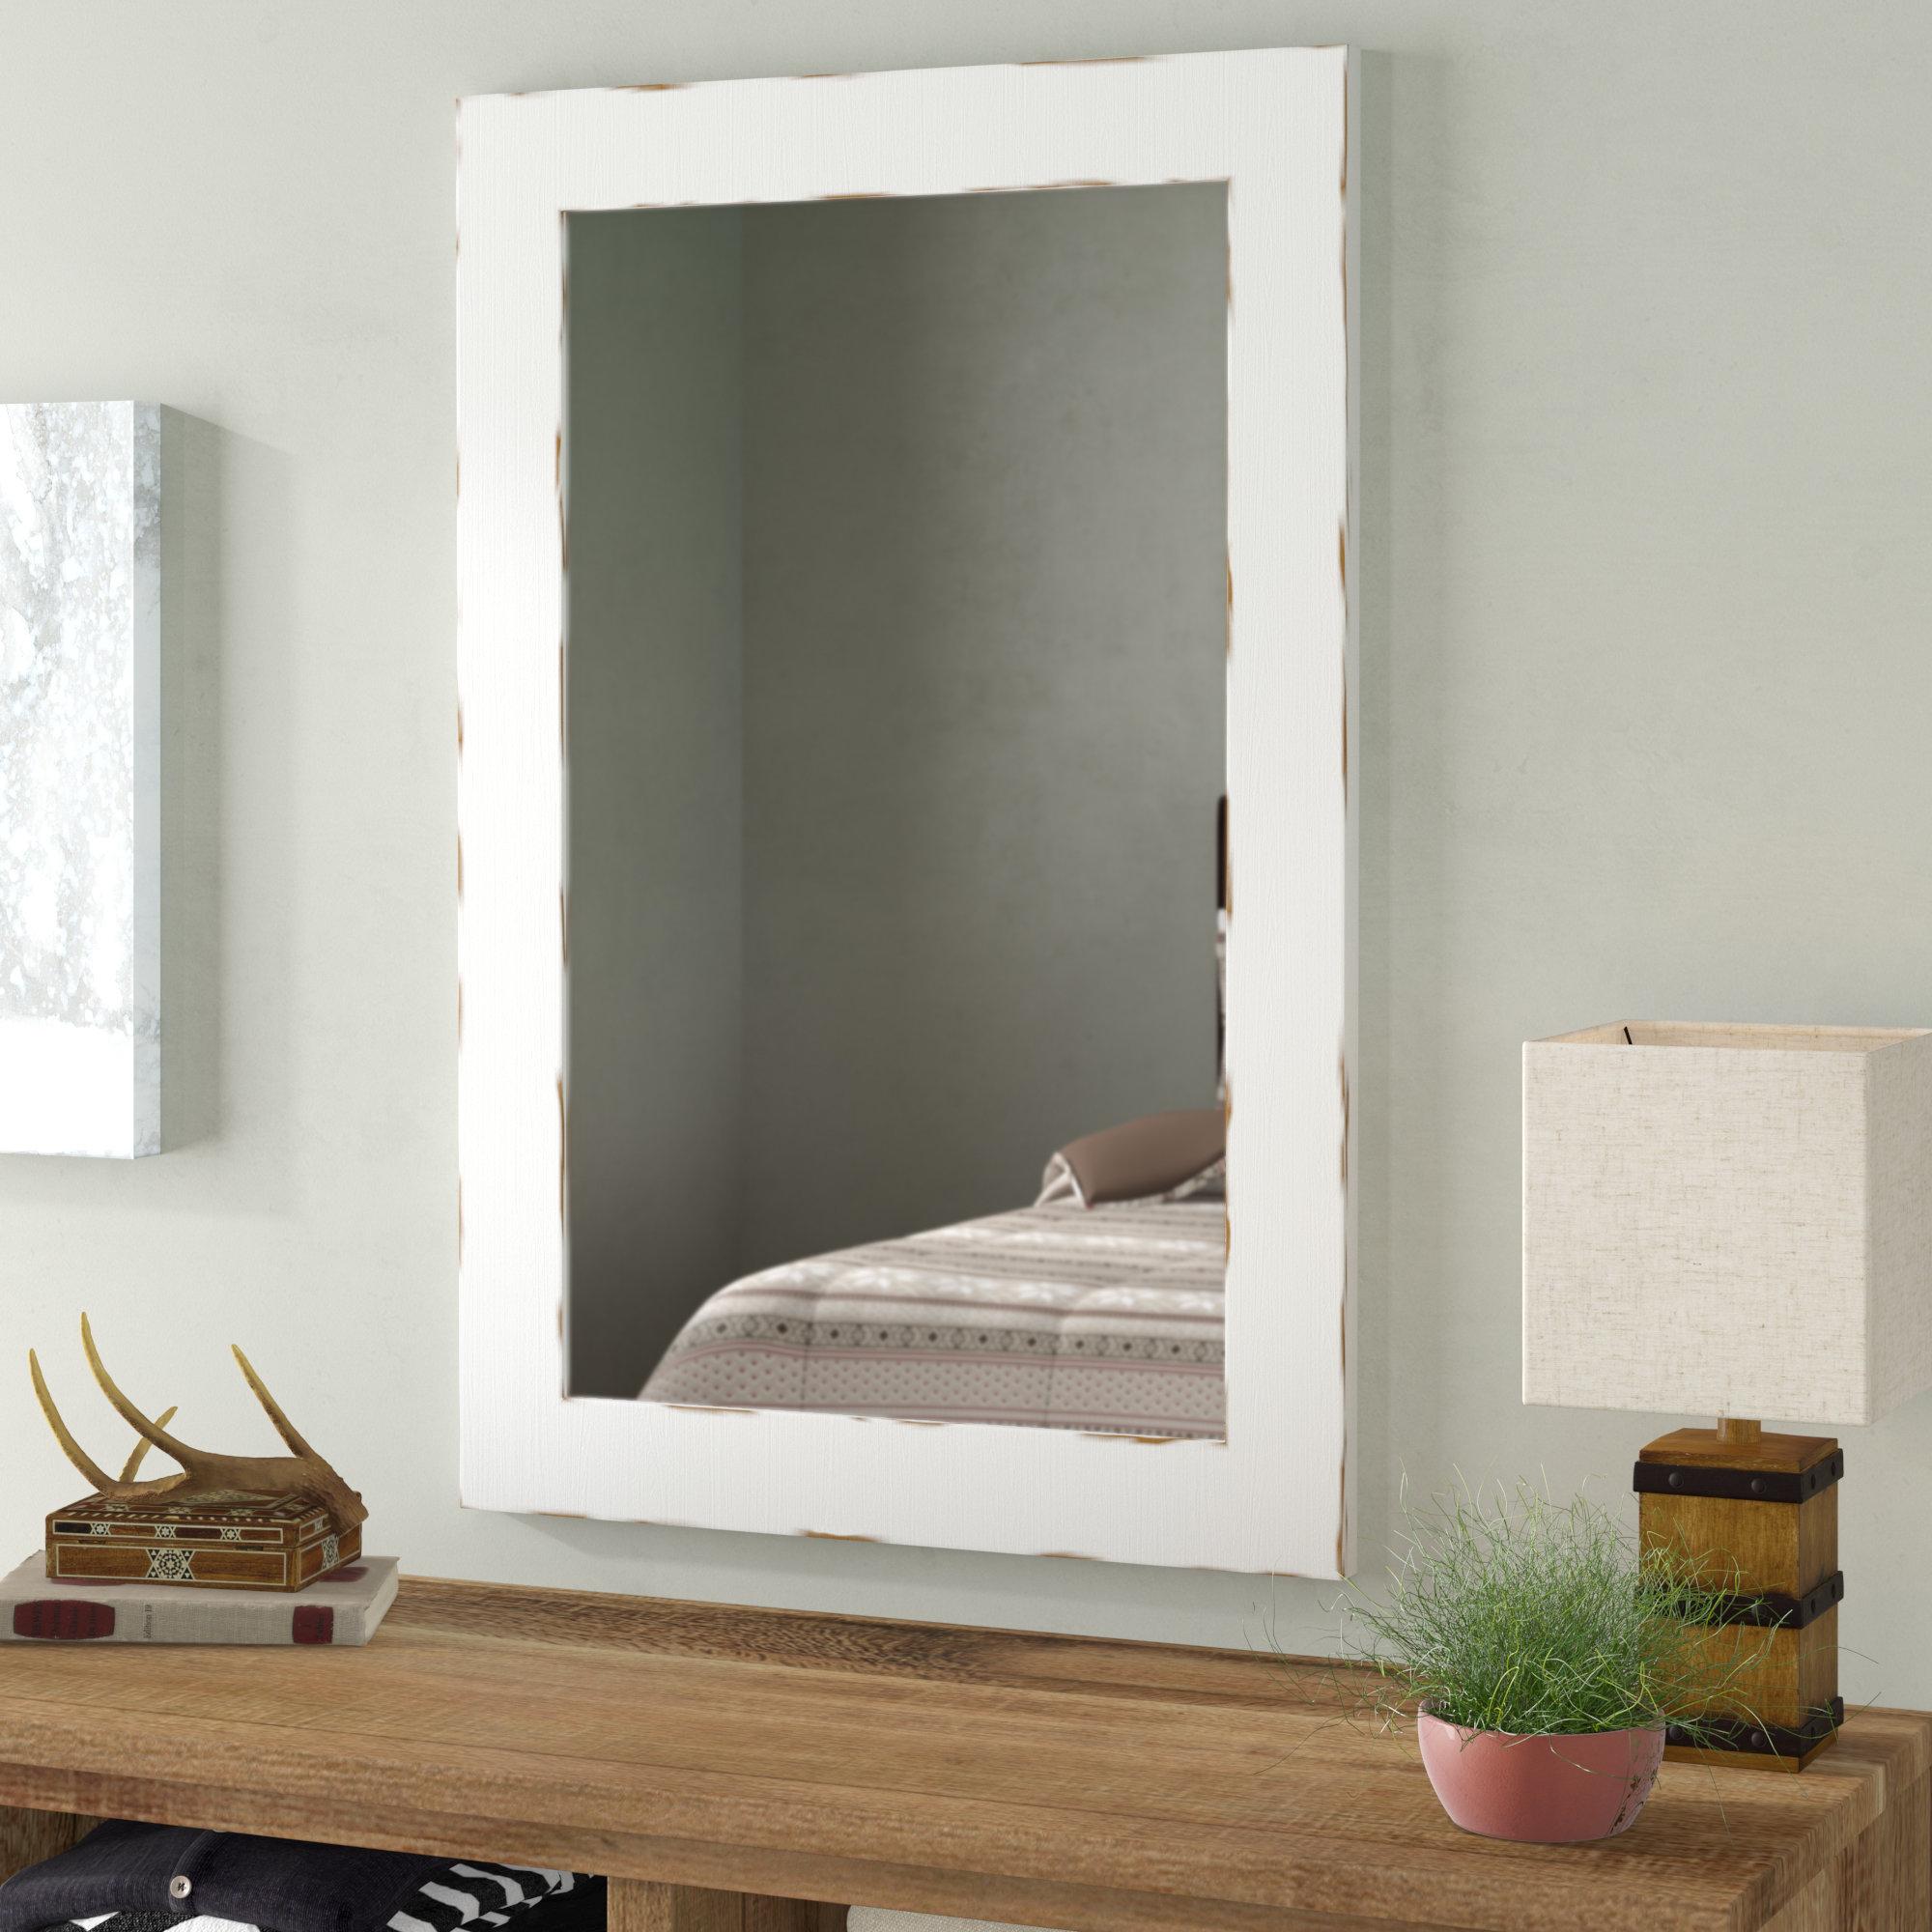 Shabby Rustic Mirror | Wayfair Regarding Epinal Shabby Elegance Wall Mirrors (Image 18 of 20)